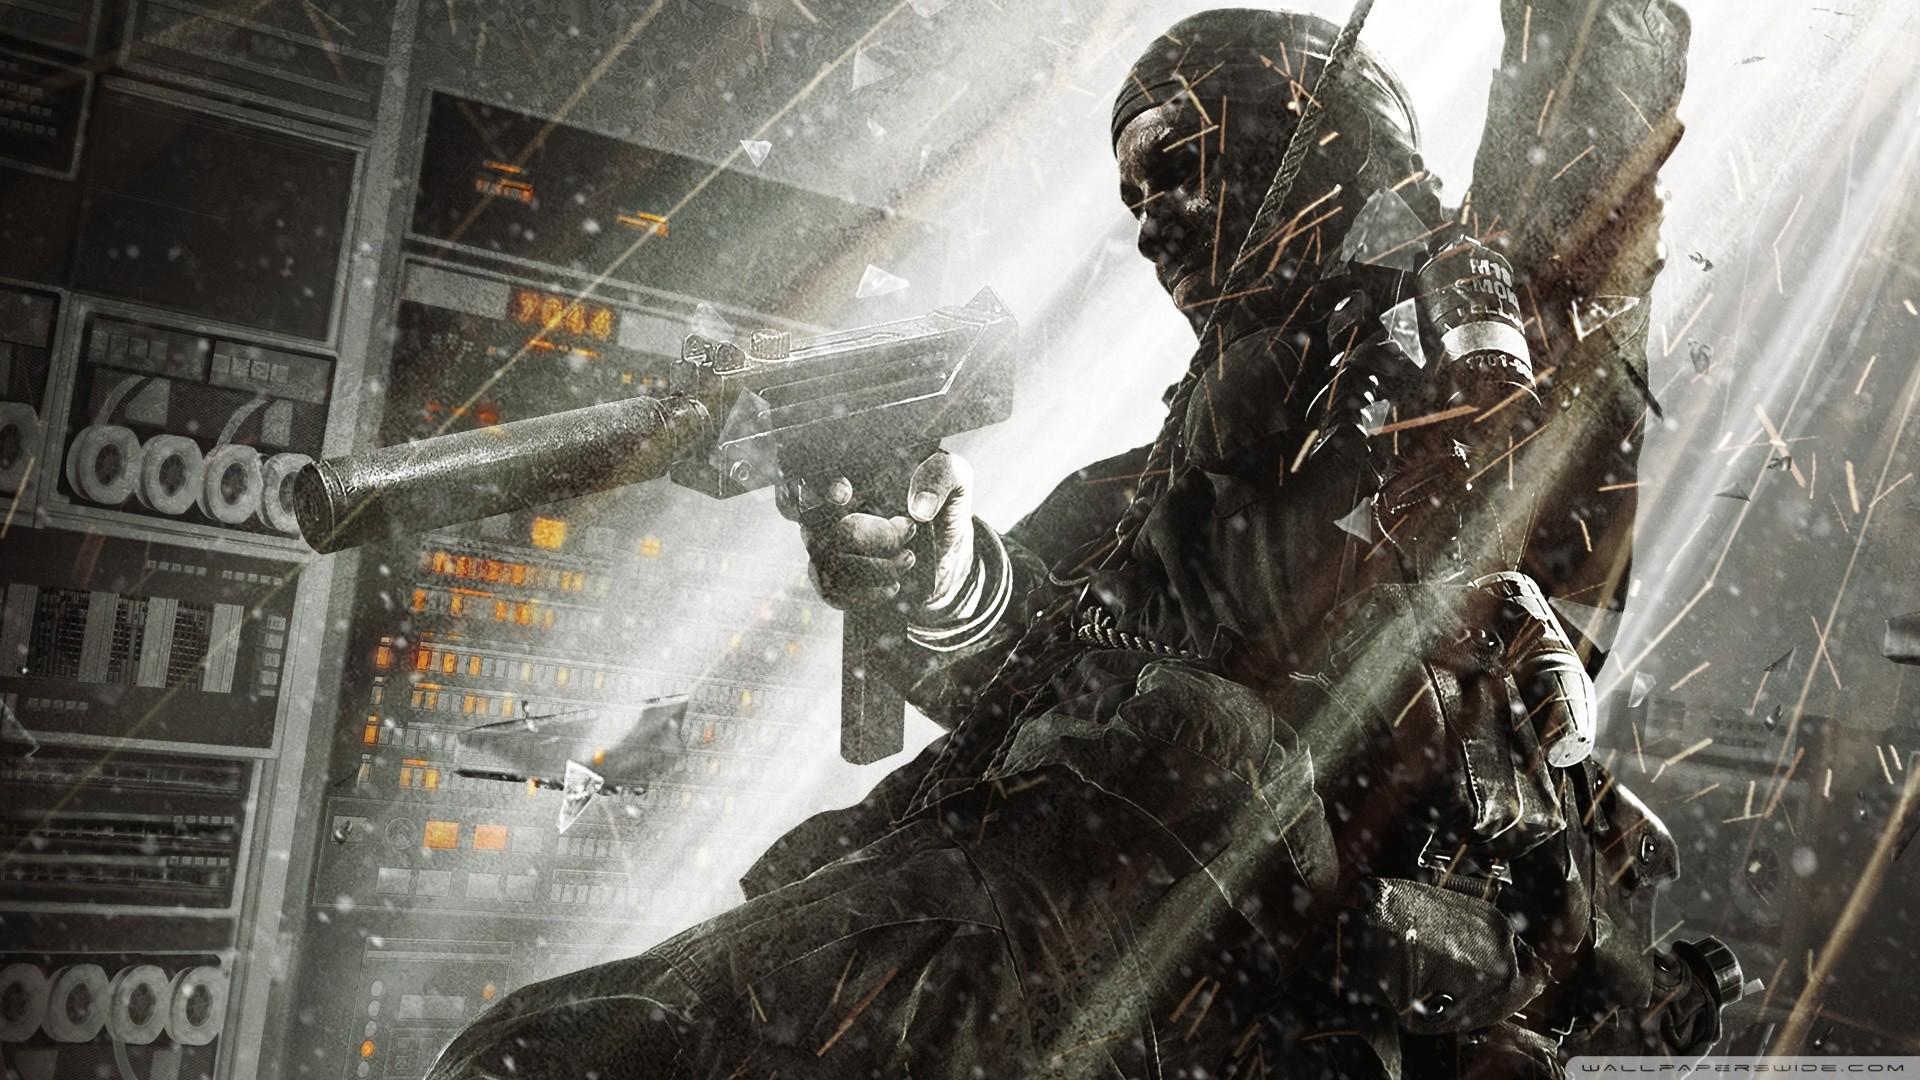 Call of Duty – Black Ops II Game HD desktop wallpaper, Call of Duty  wallpaper, Black Ops wallpaper, Black Ops II wallpaper – Games no.